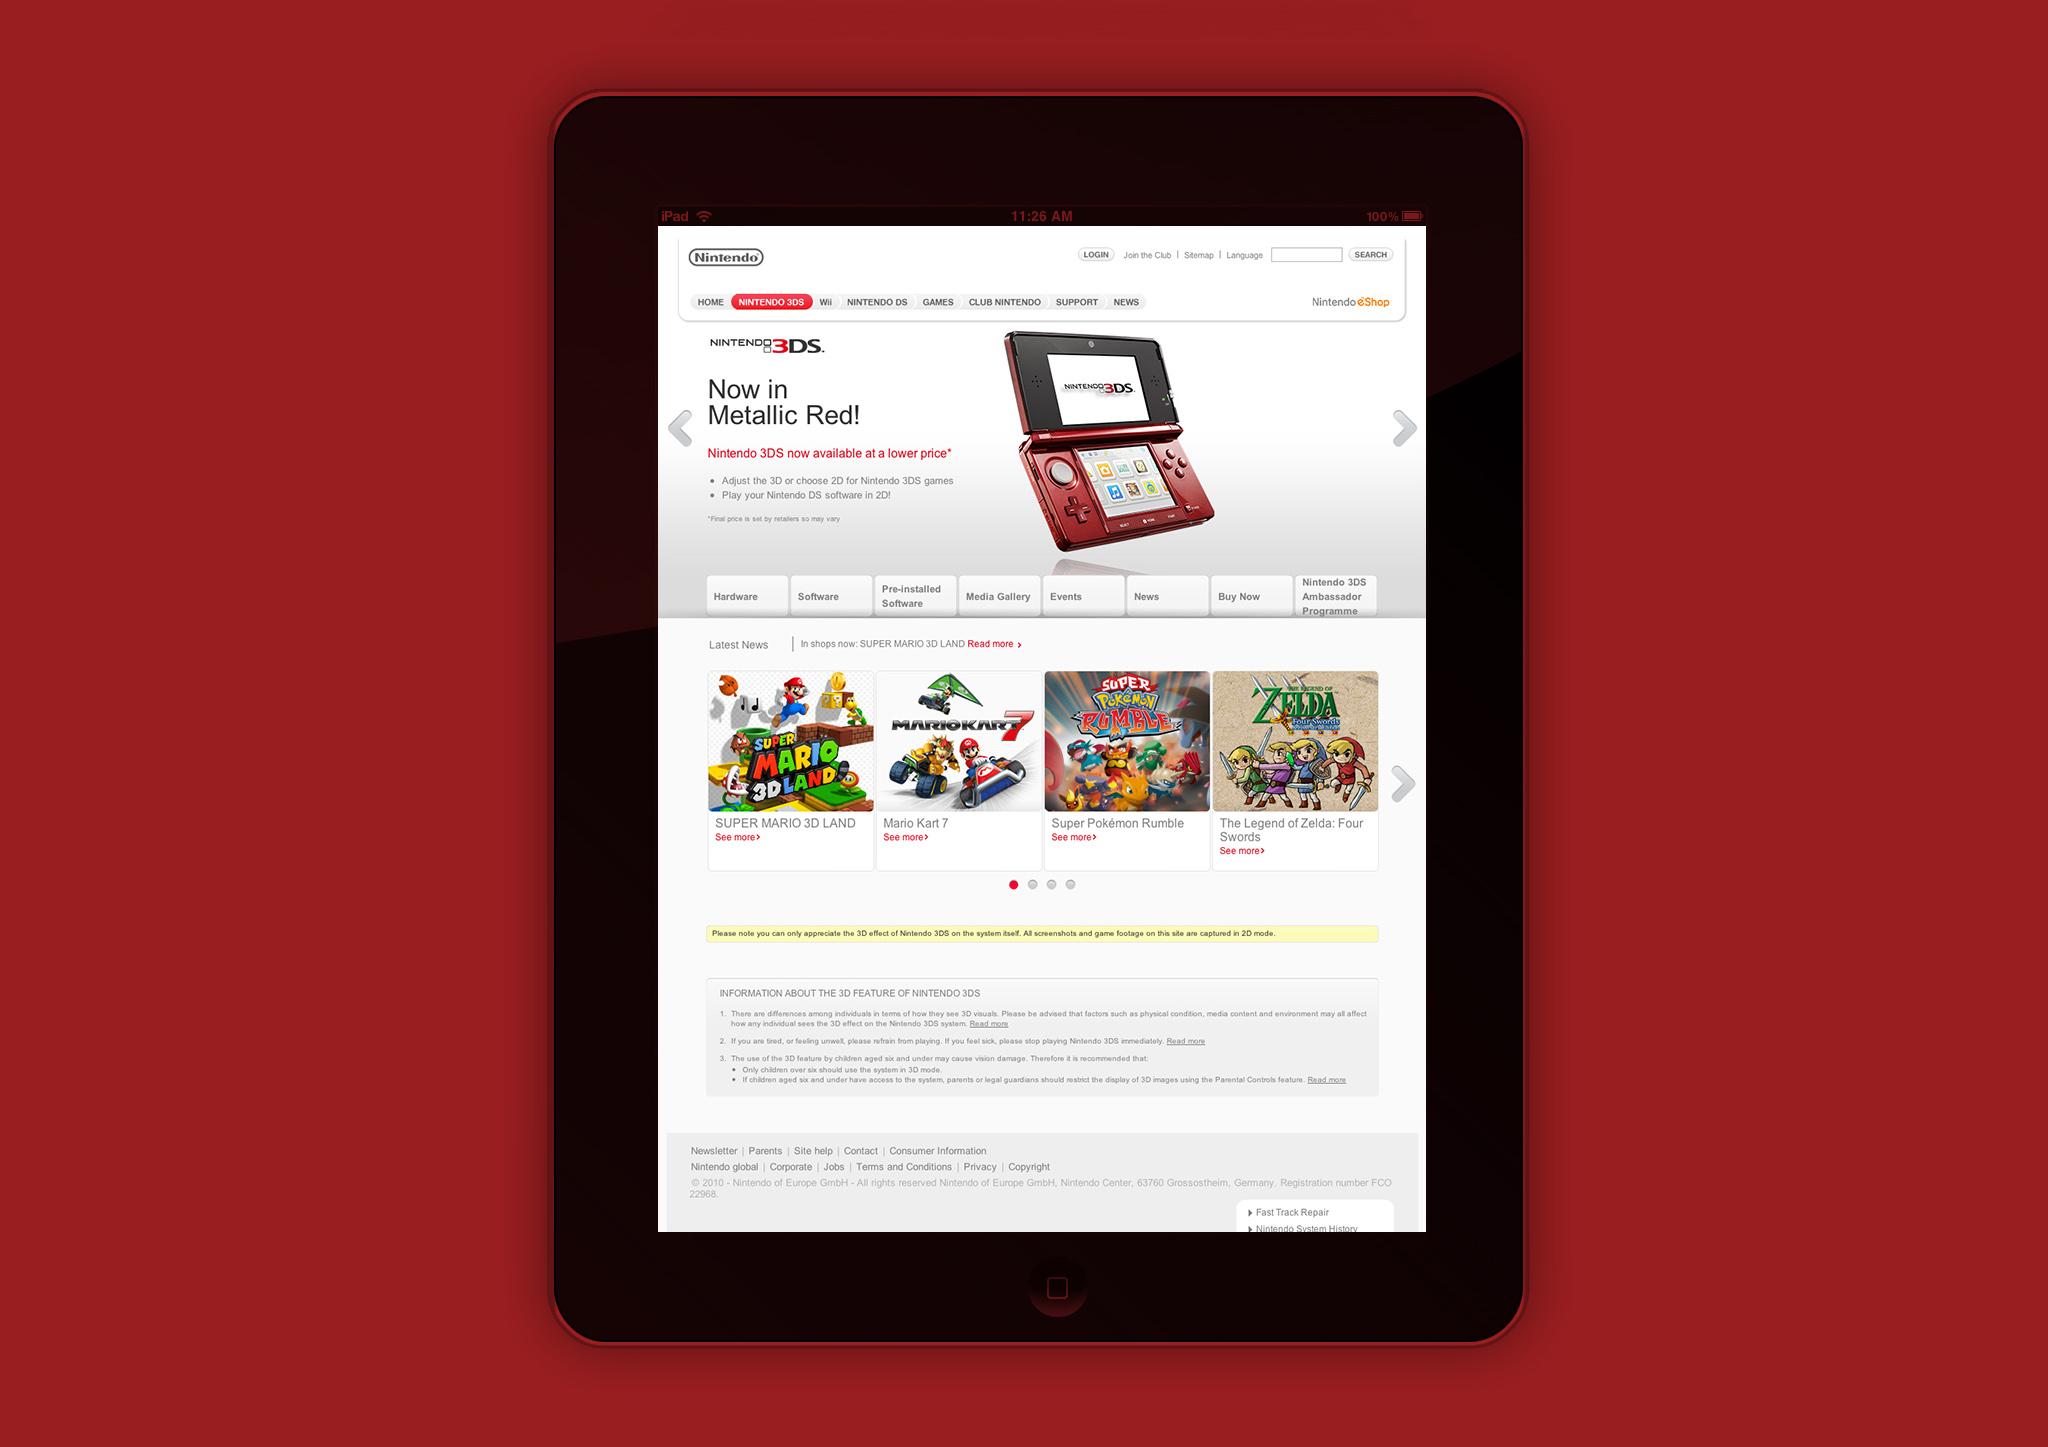 3DS-flame-Red-nintendo-website-ipad.jpg